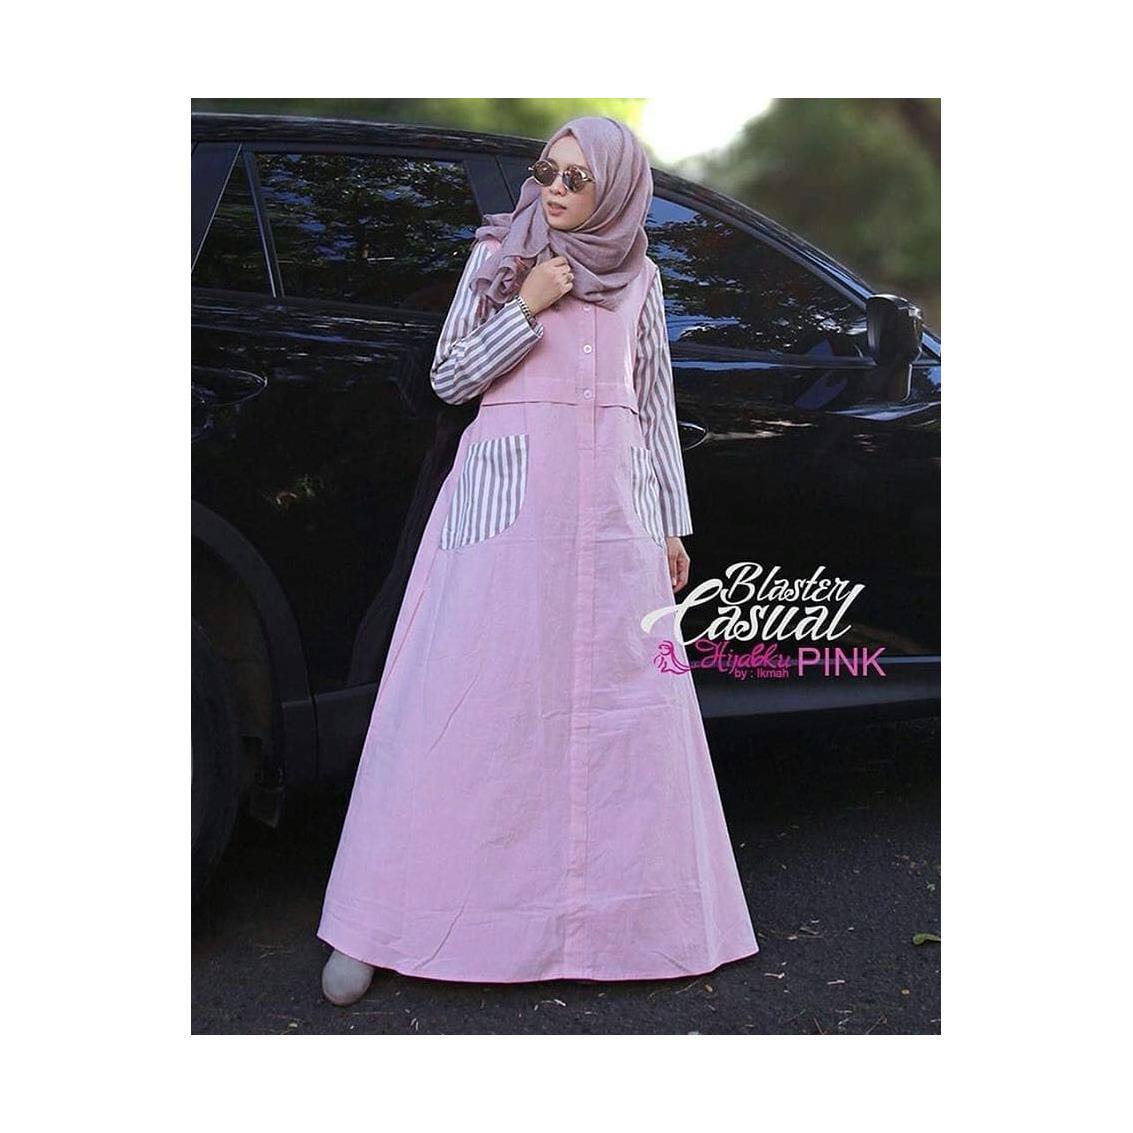 Baju Blaster Casual Maxi Dress Panjang  Balotelly Hijab Casual Pakaian Muslim Wanita Muslim Modern Terbaru Termurah  2018